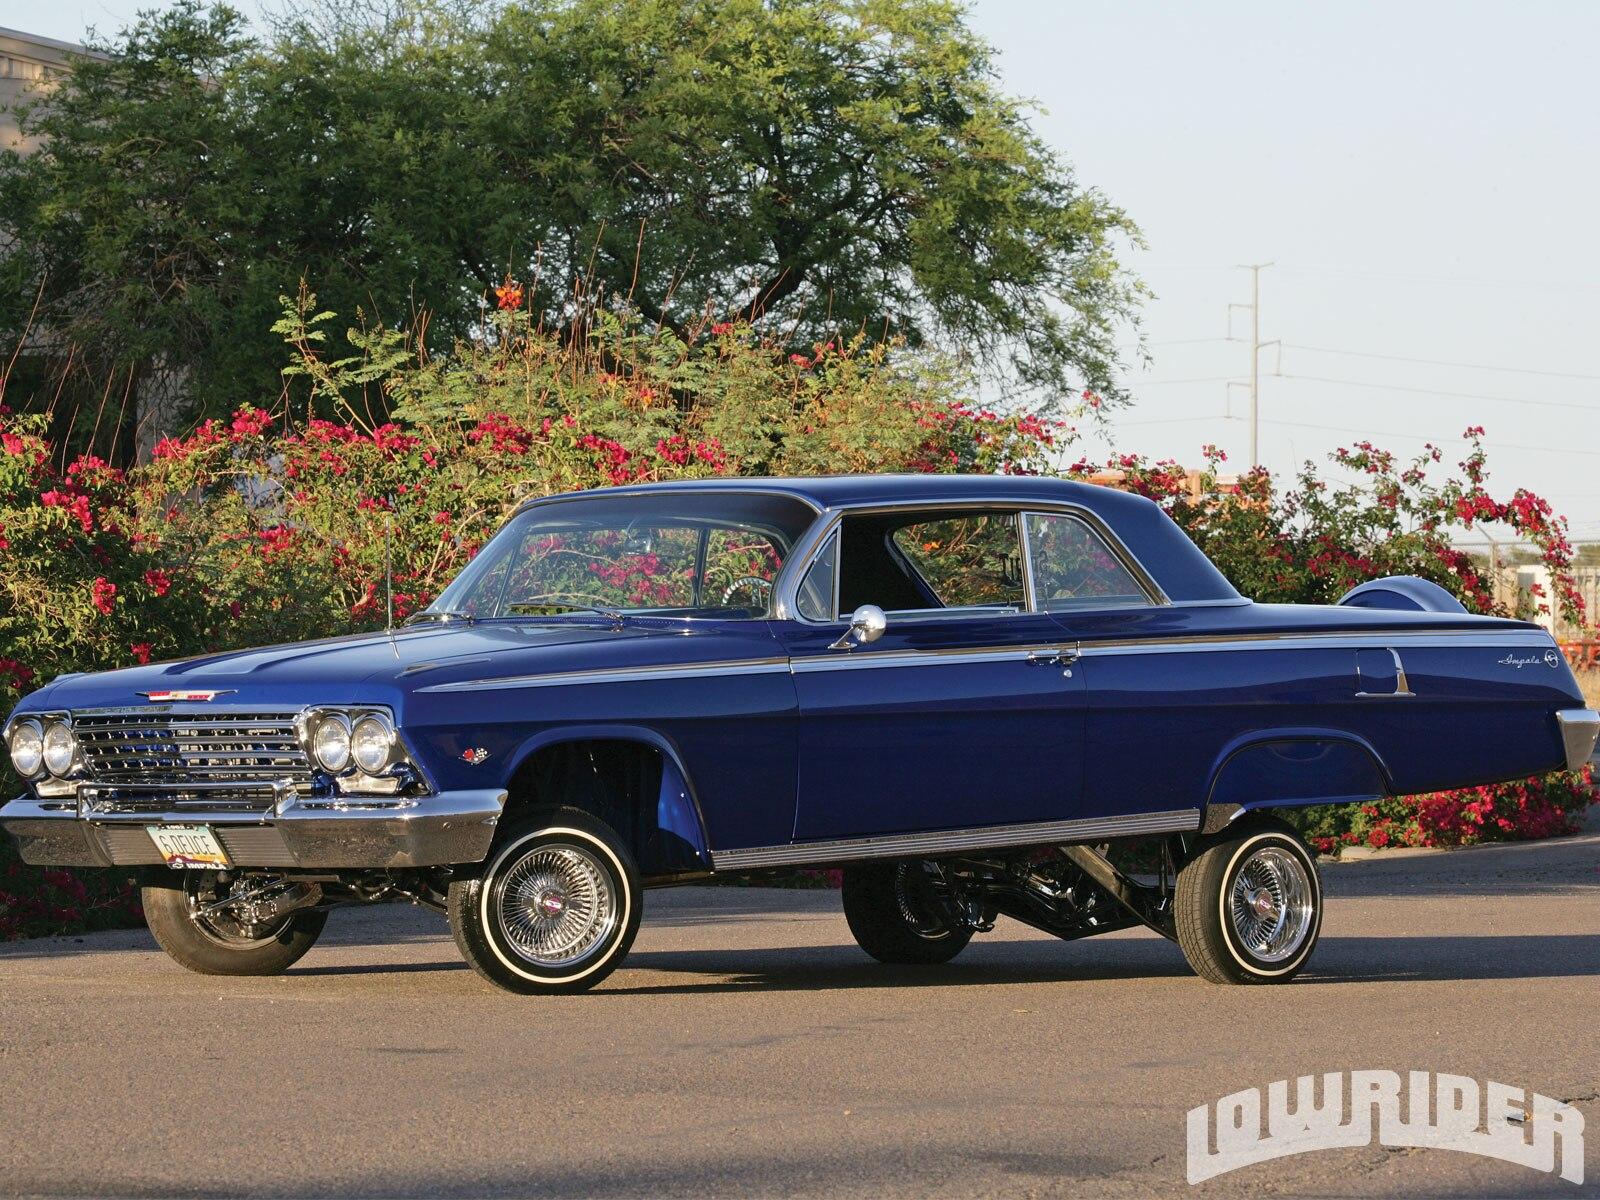 1962 Chevrolet Impala Lowrider Magazine